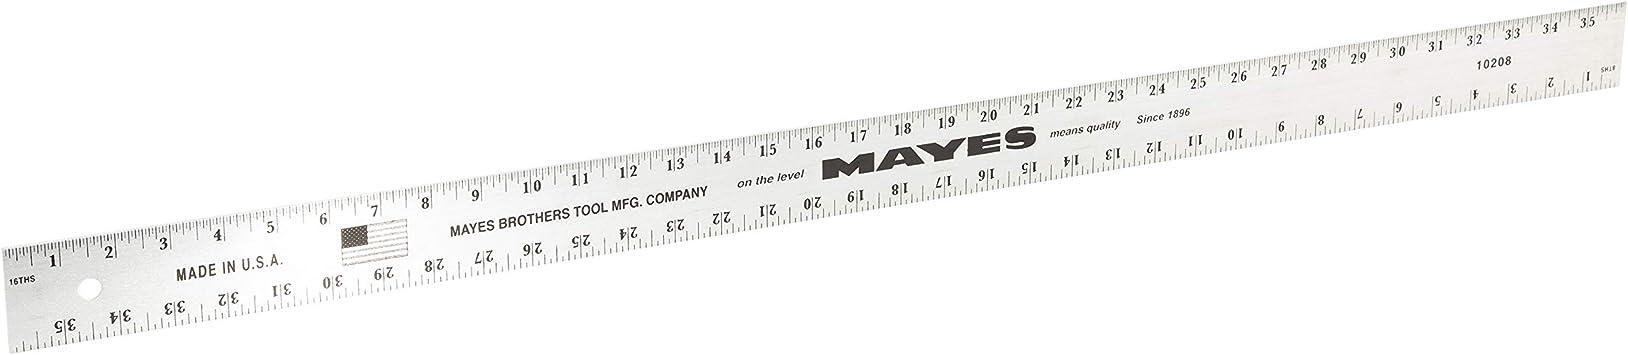 Mayes 96 Inch x 2 Inch Straight Edge Aluminum Ruler